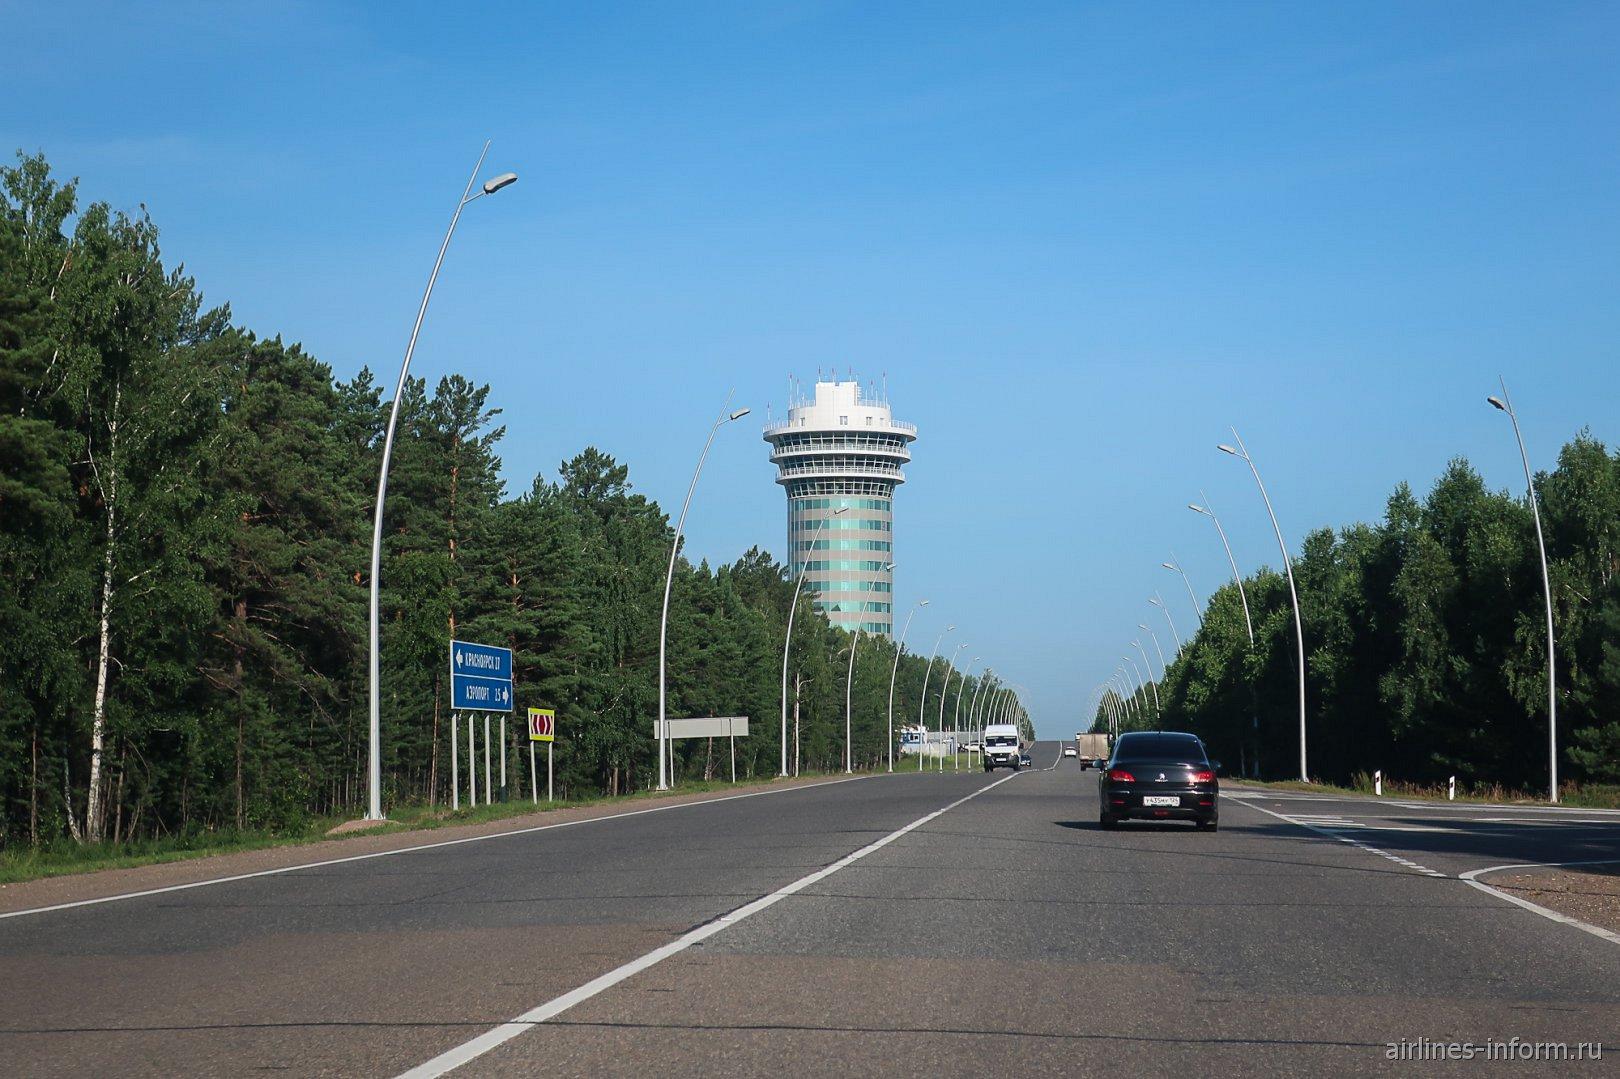 Башня аэронавигации красноярского аэропорта